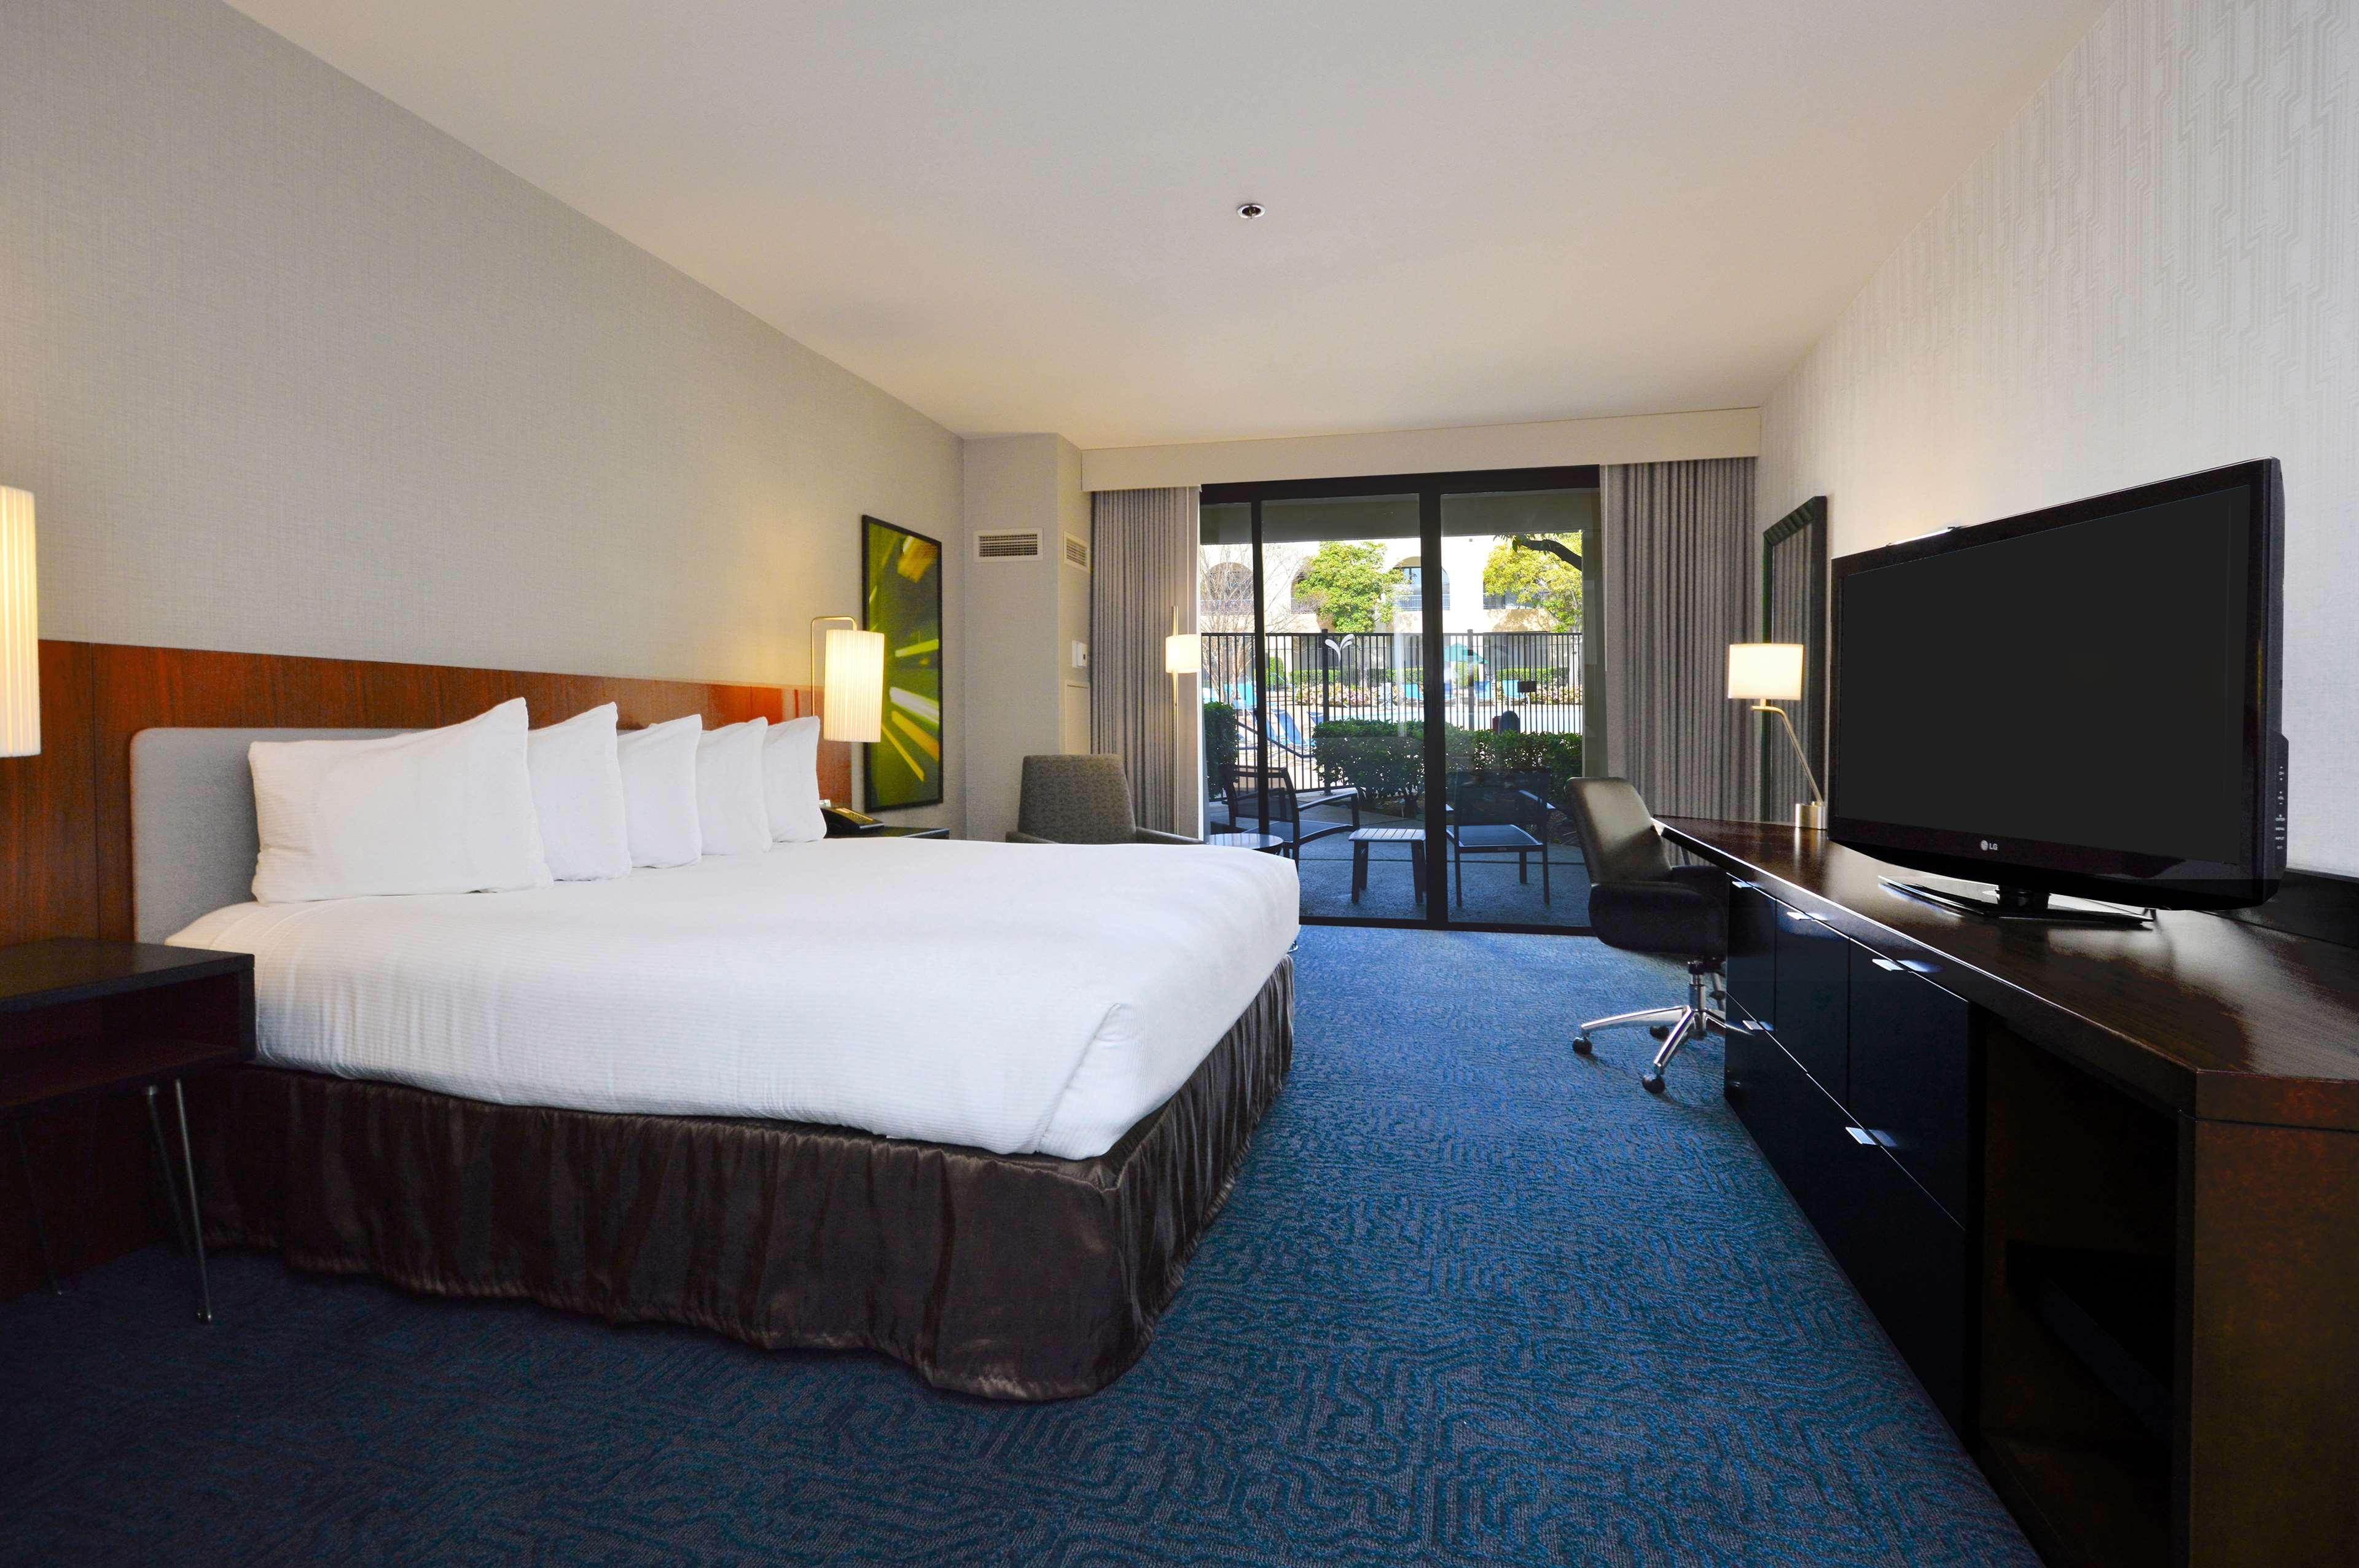 DoubleTree by Hilton Hotel Newark - Fremont image 26